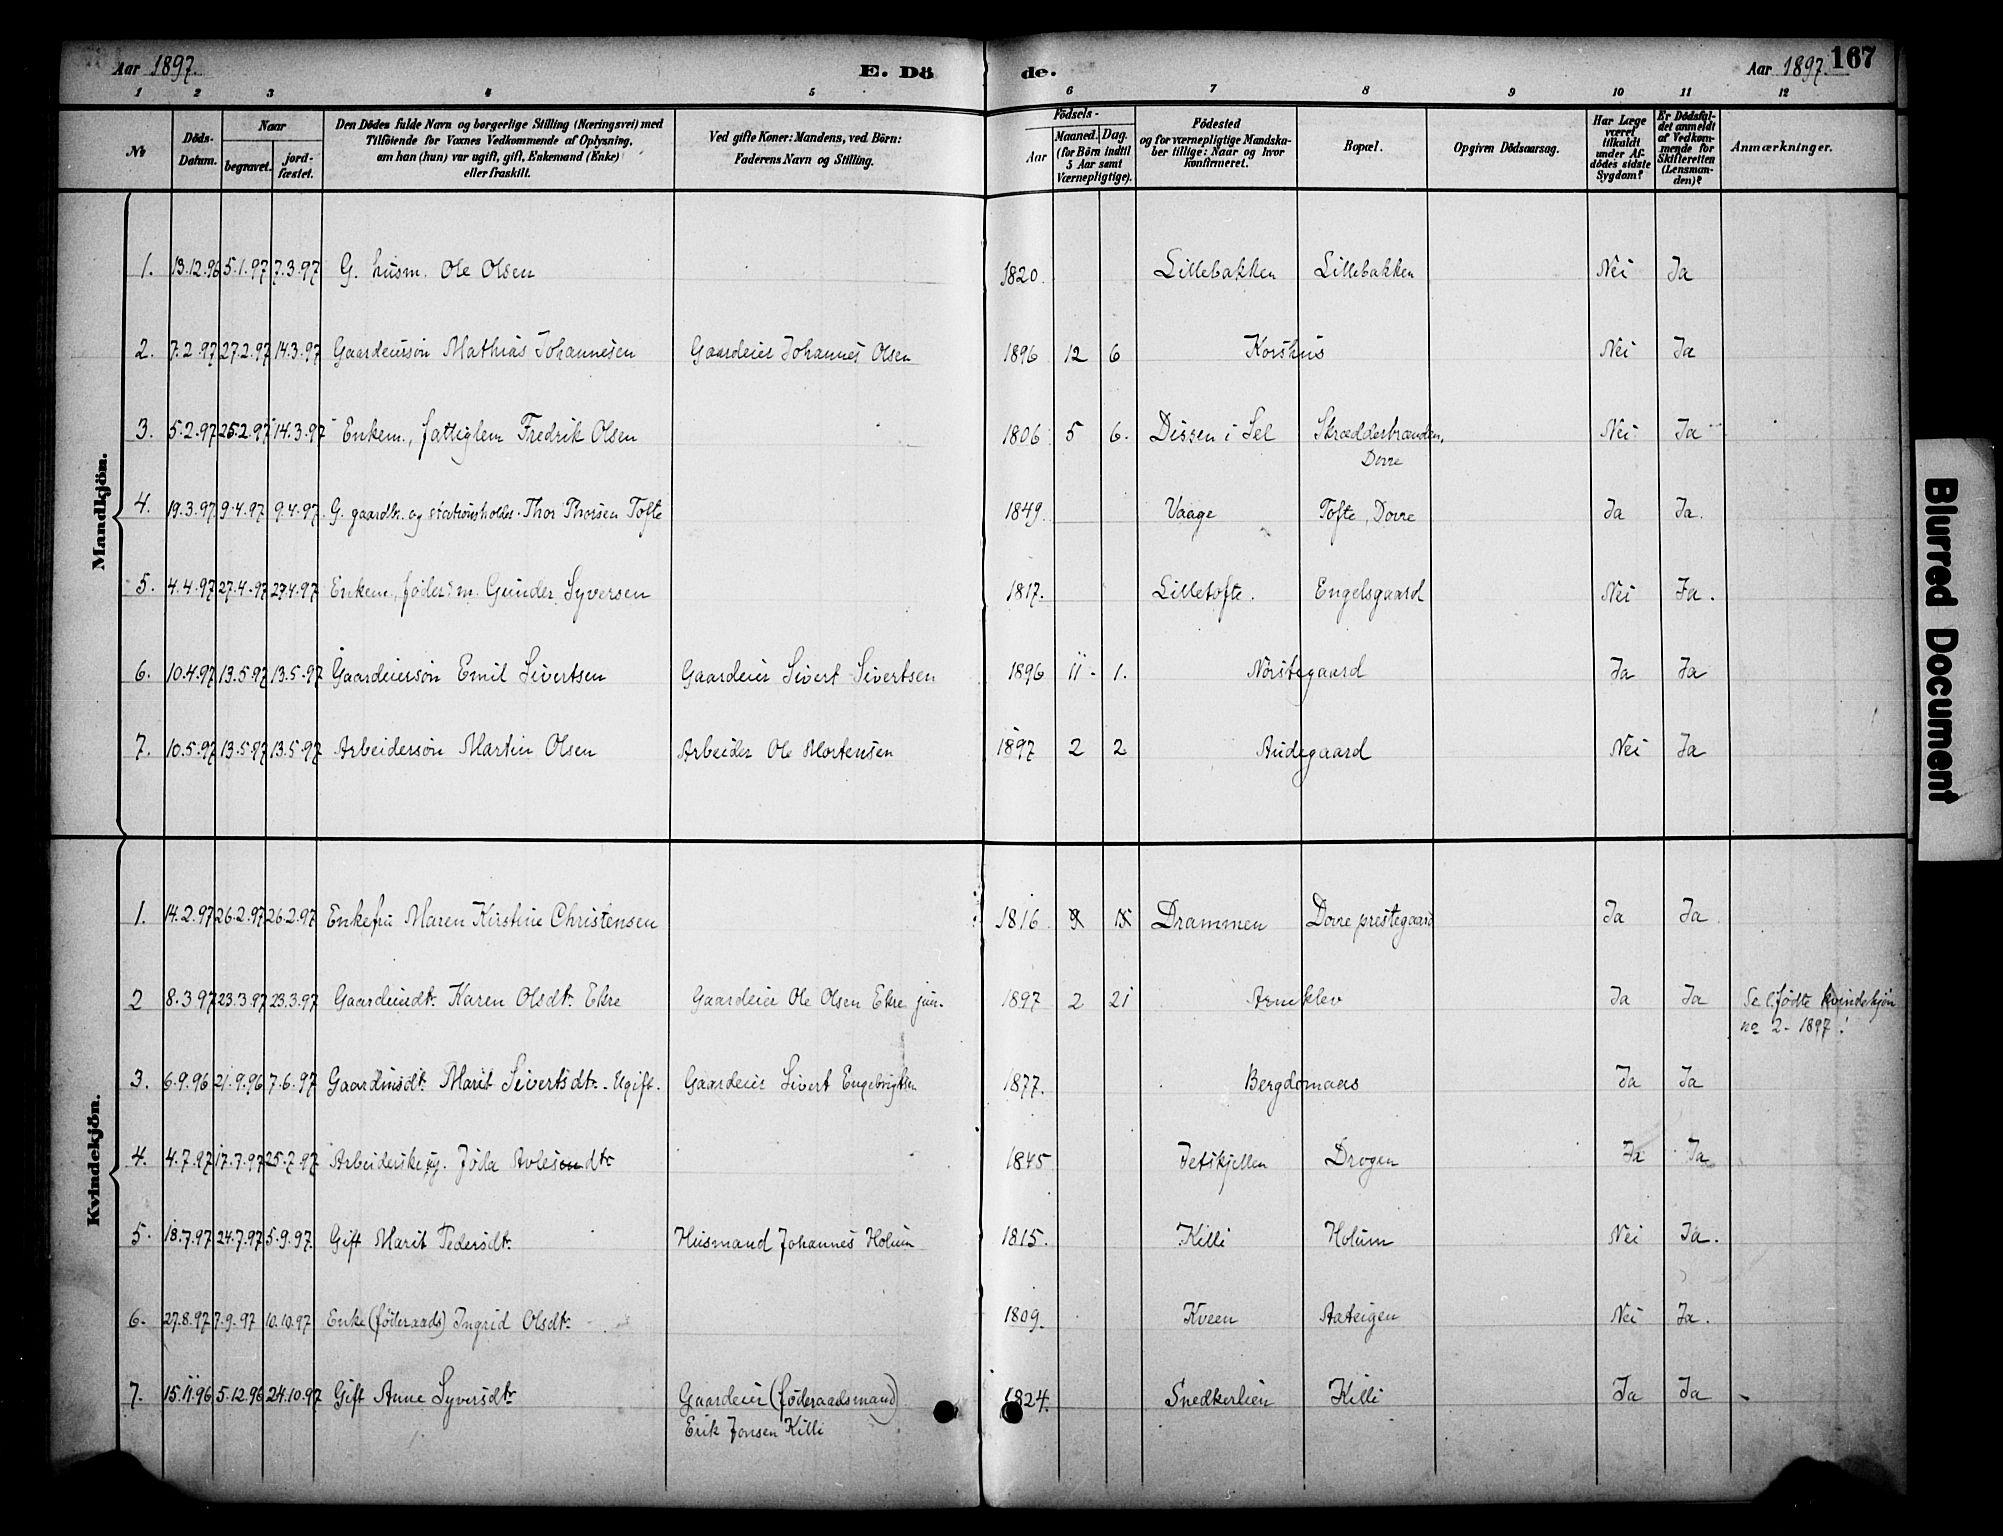 SAH, Dovre prestekontor, Ministerialbok nr. 3, 1891-1901, s. 167